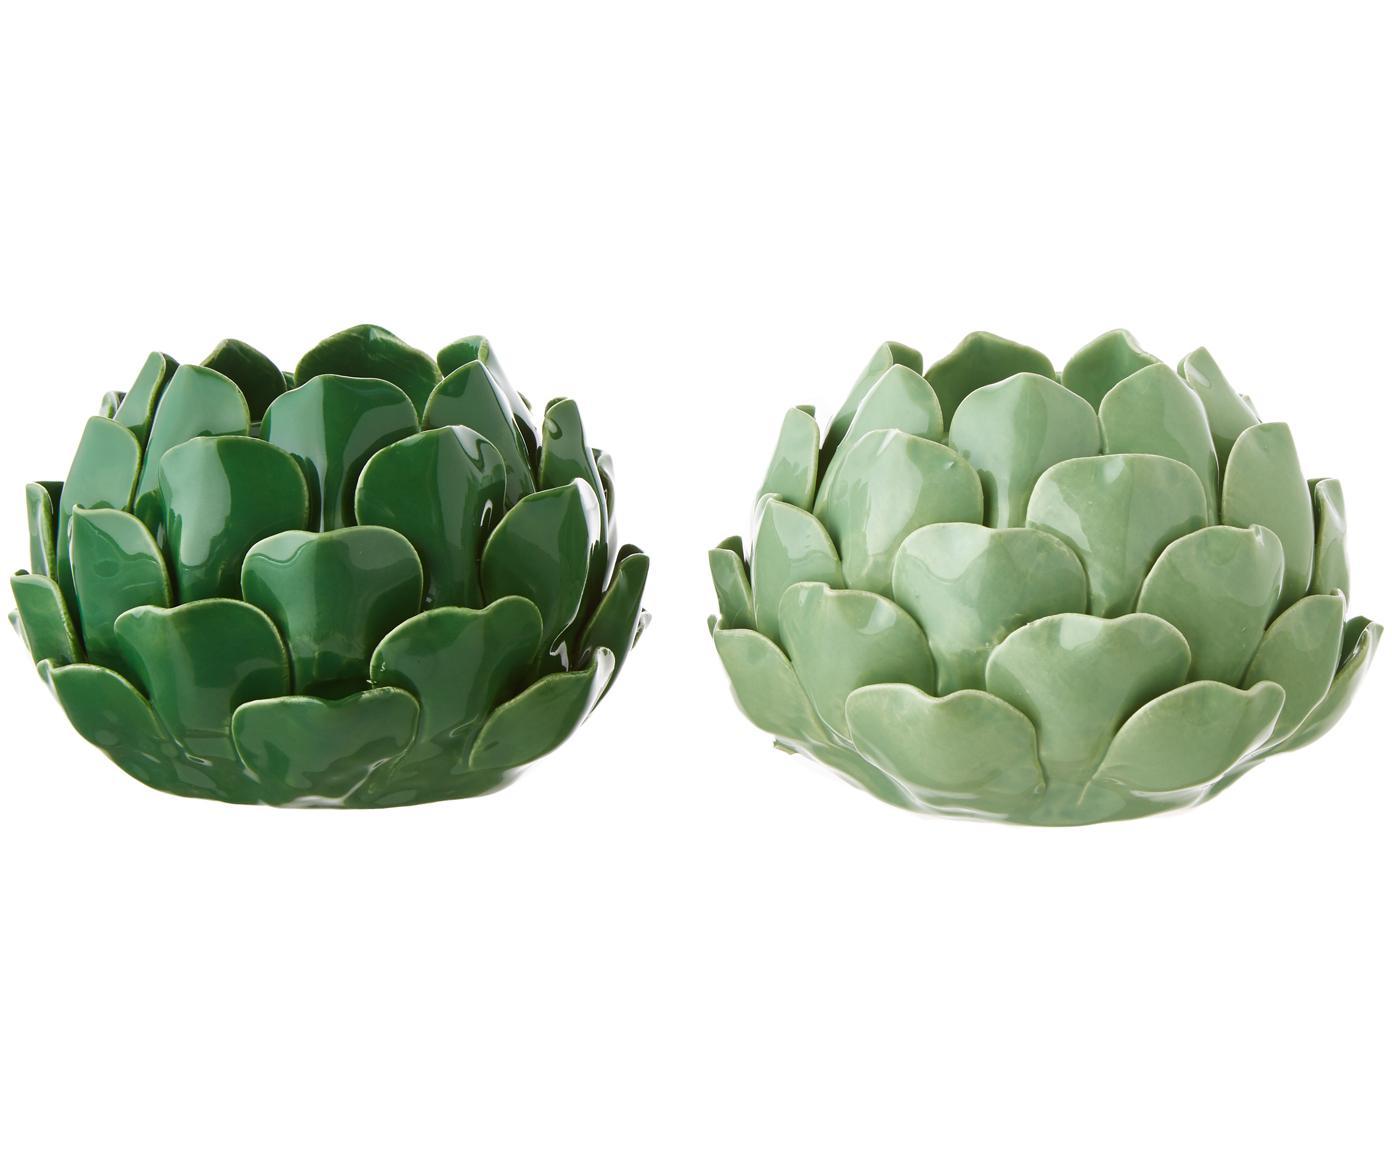 Set de portavelas Rose, 2pzas., Gres, Verde claro, verde oscuro, Ø 14 x Al 9 cm